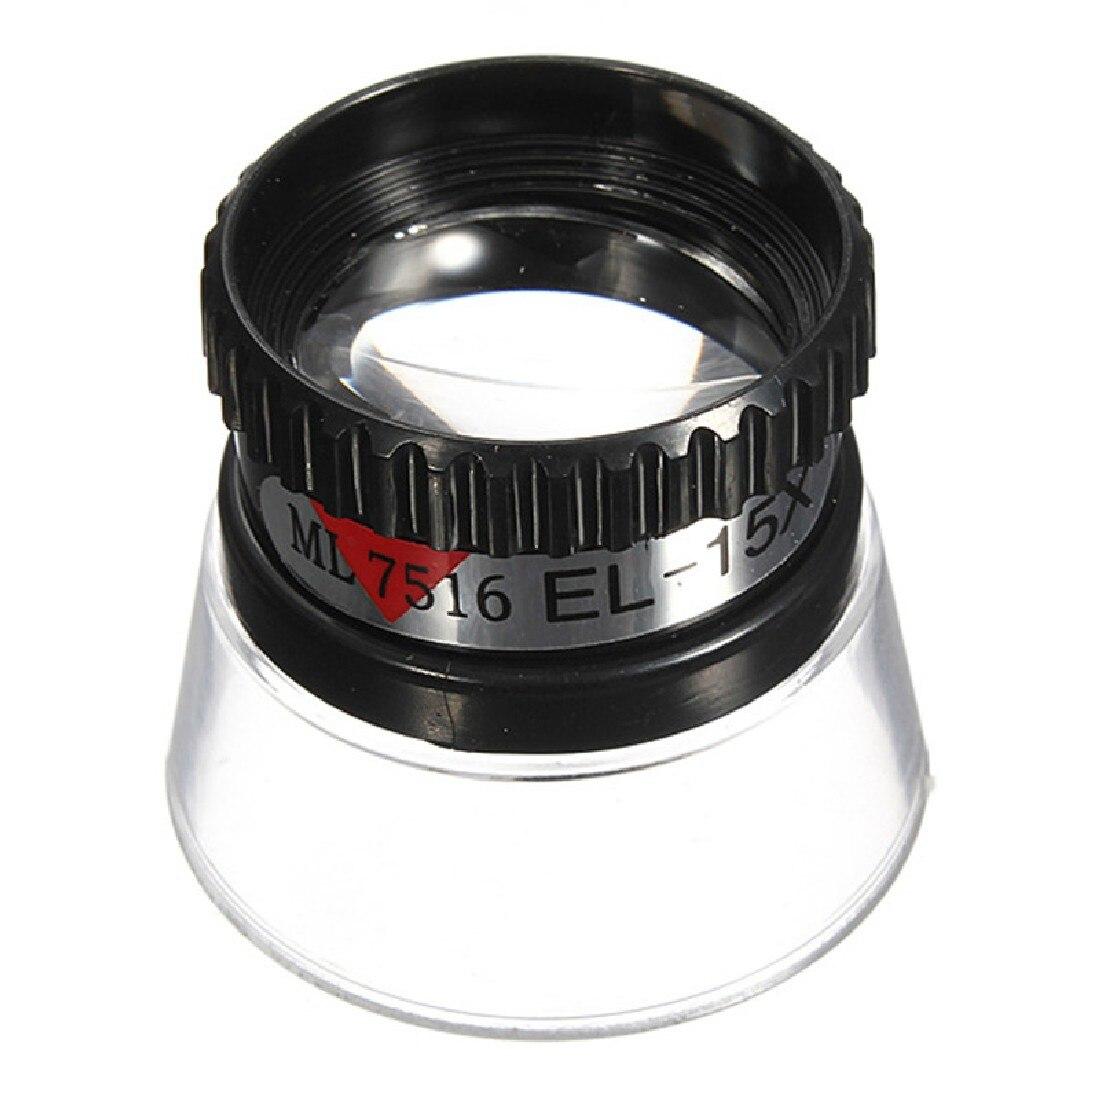 Magnifying Glass 22mm 15X Monocular Loupe Lens Jeweler Tool Eye Magnifier Watch Repair Tool Black Portable Tools 9892d headset watch repair magnifier tool w led white light black